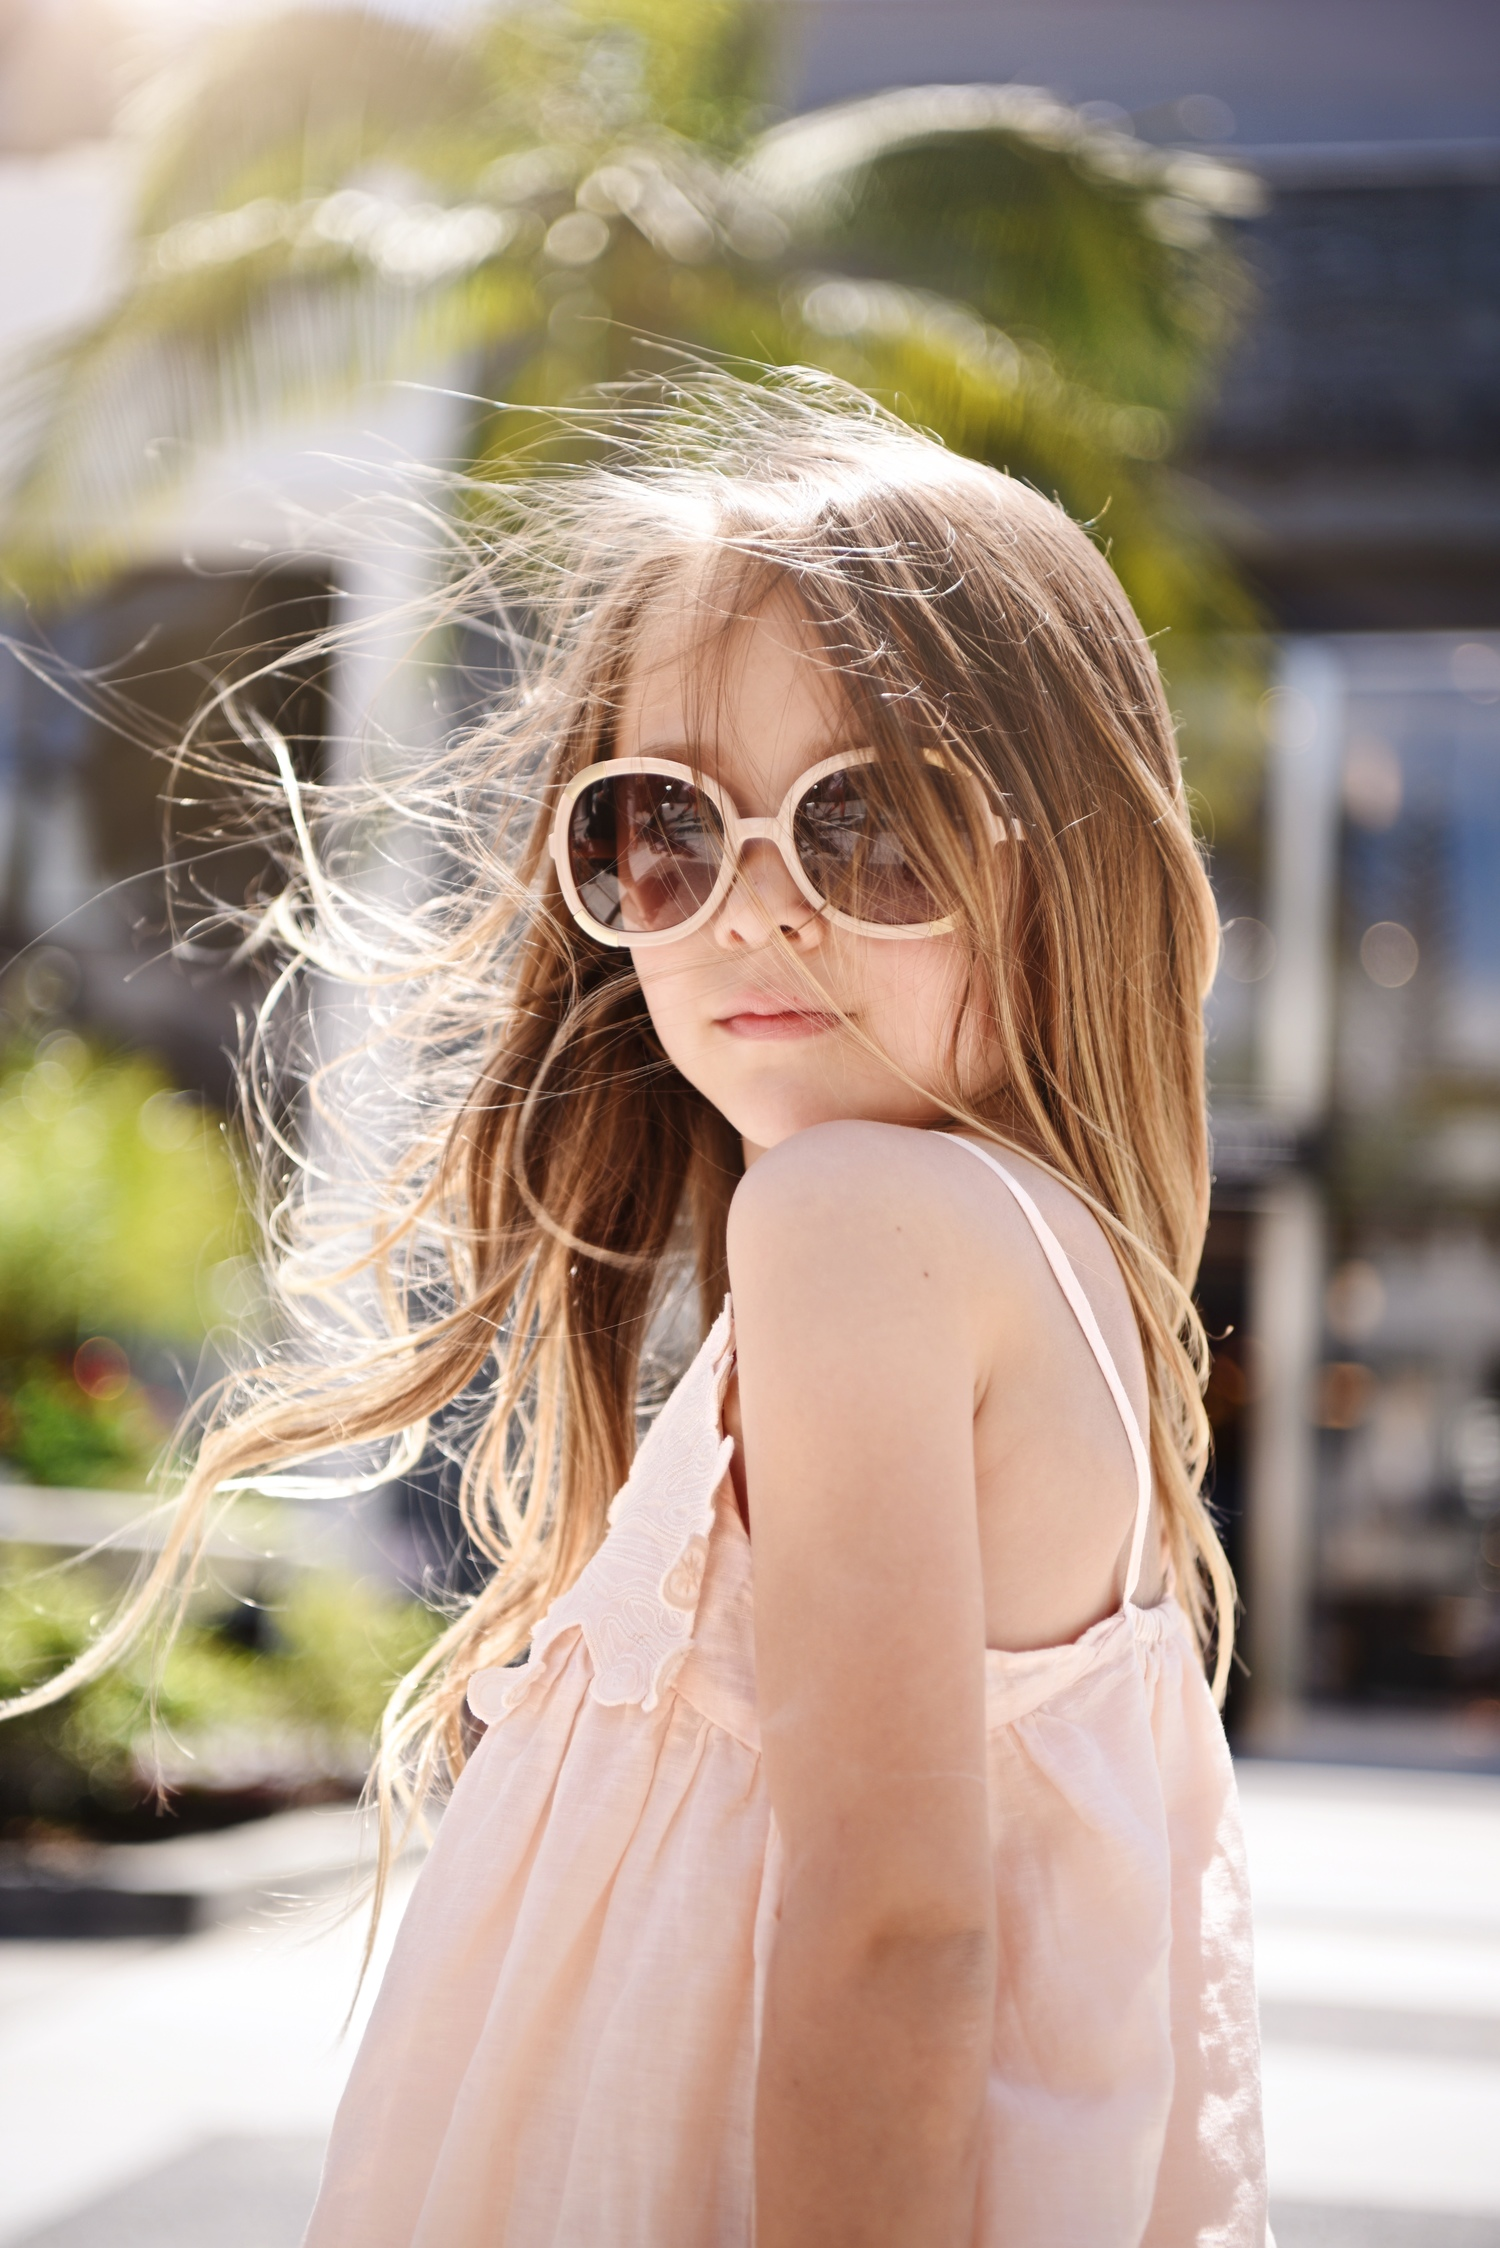 Enfant+Street+Style+by+Gina+Kim+Photography+Chloe+girls-1.jpeg